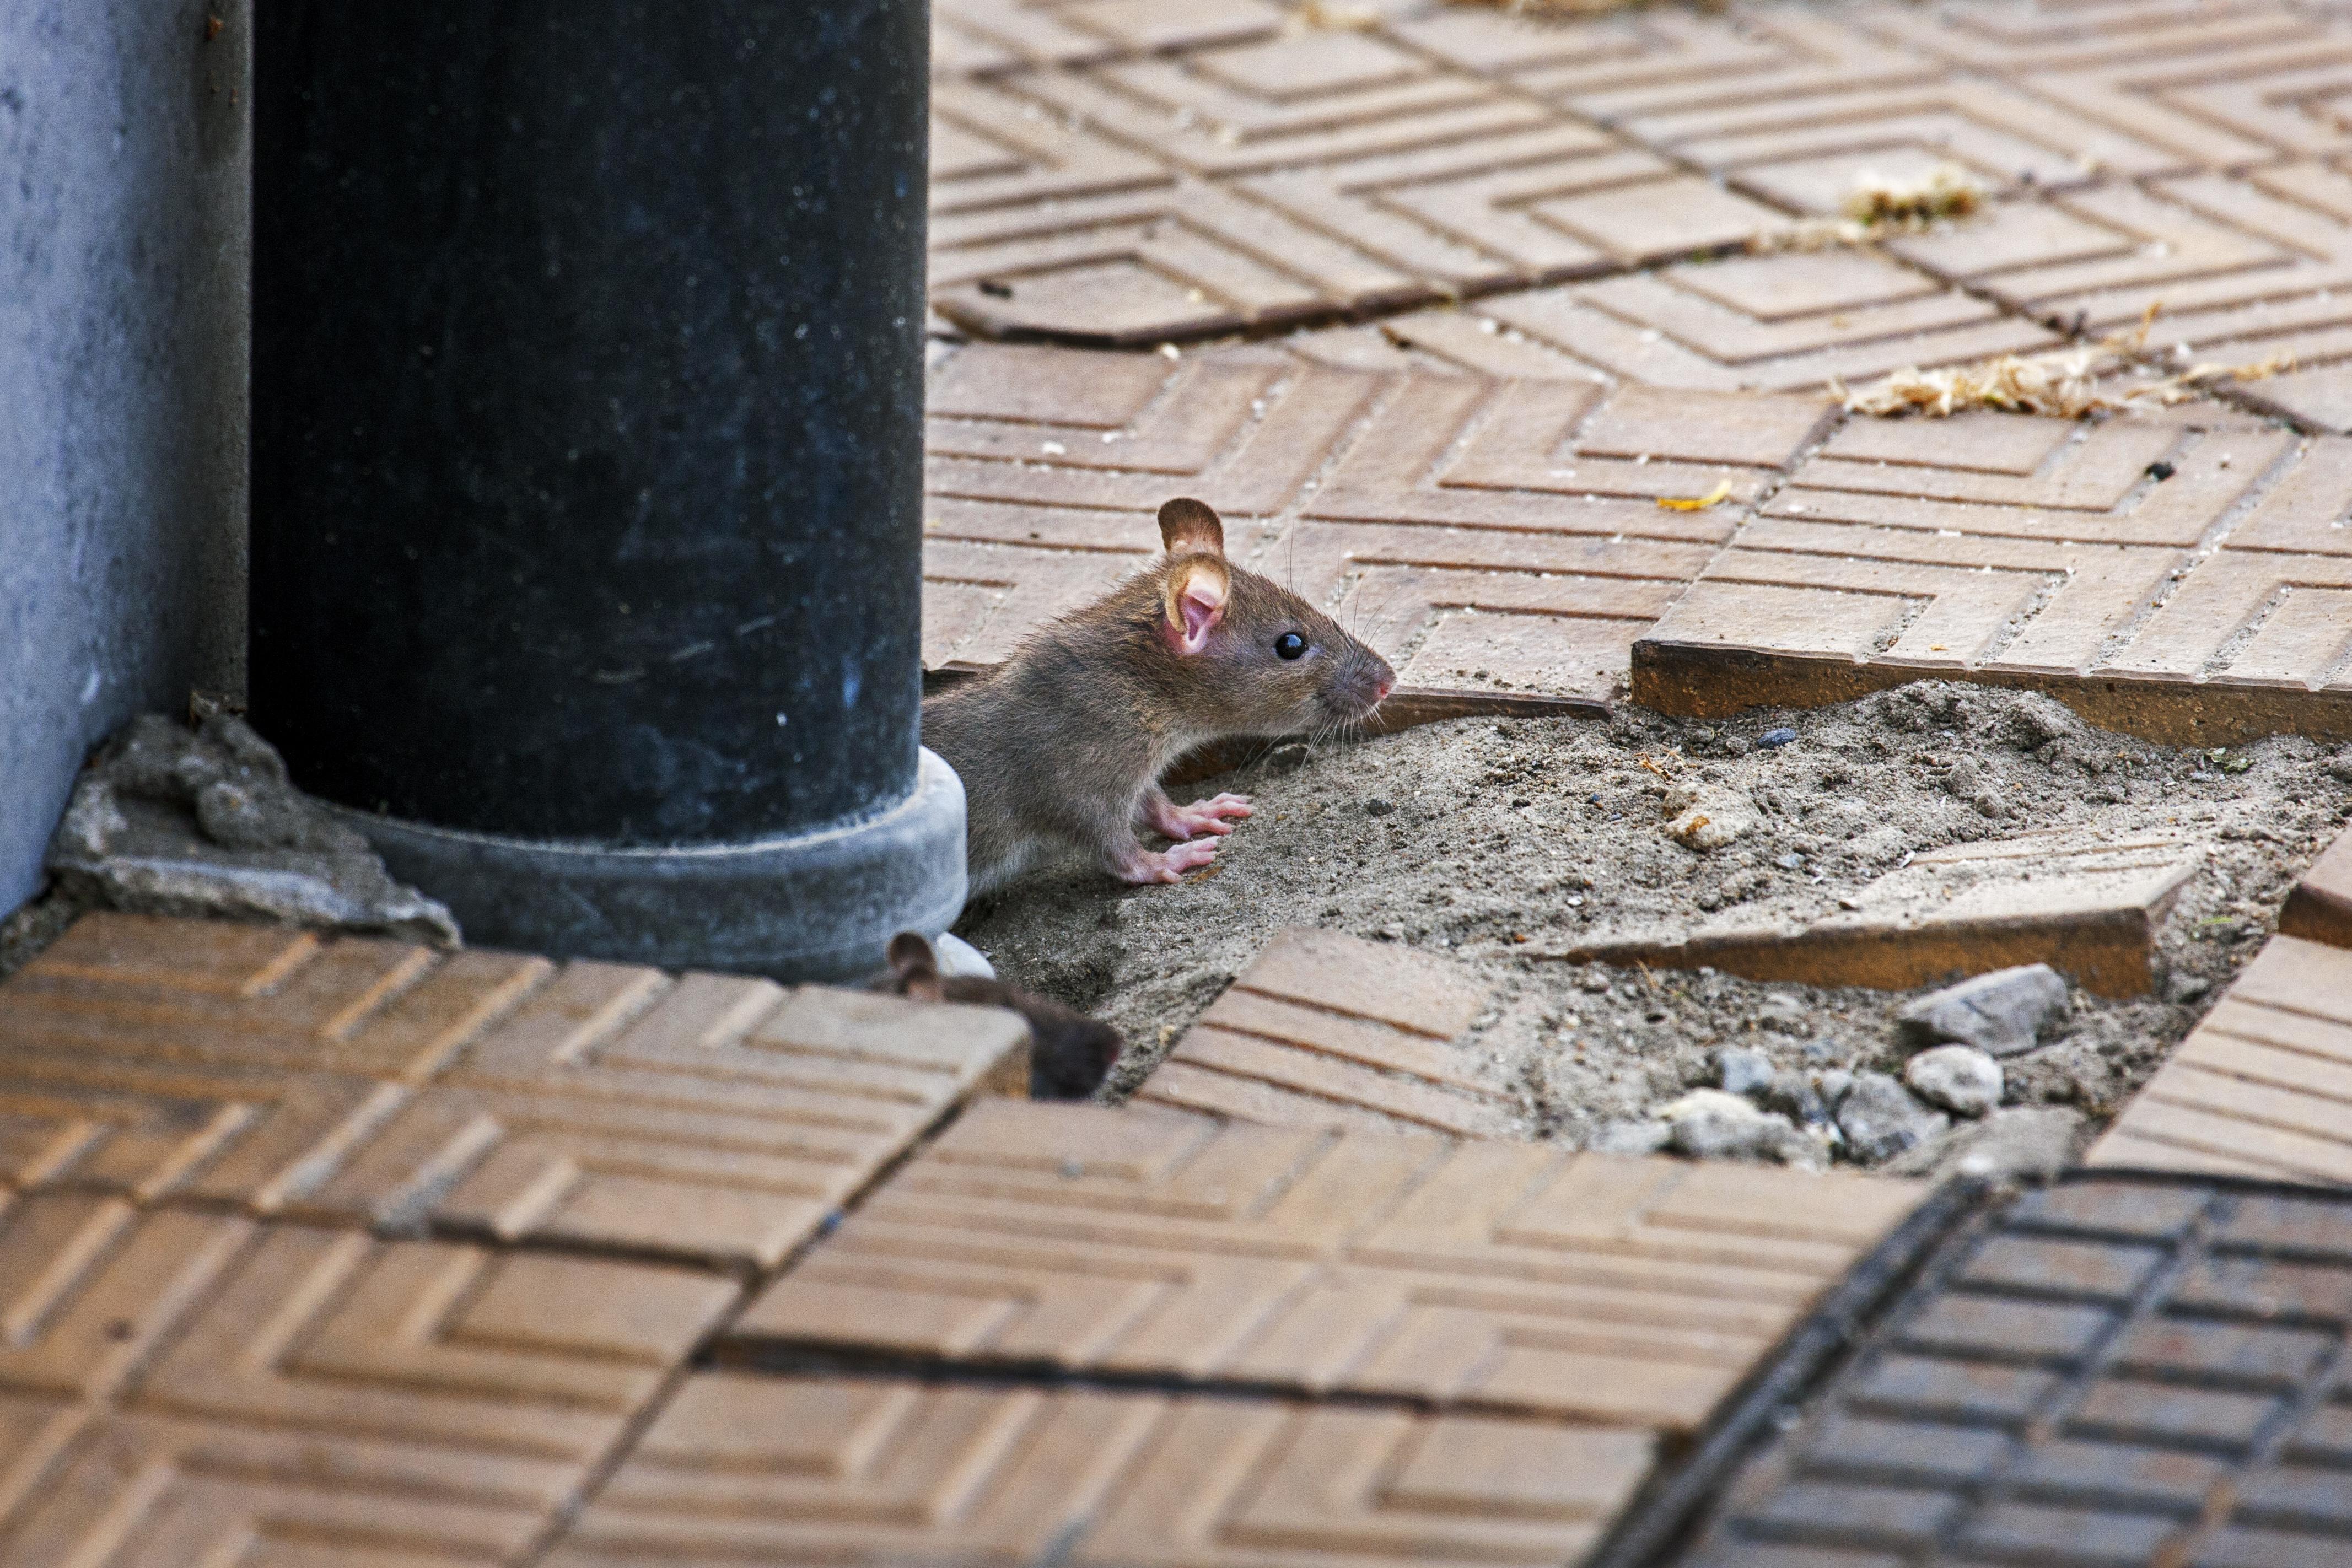 Juvenile brown rat / Common rat (Rattus norvegicus) emerging from drainpipe on pavement